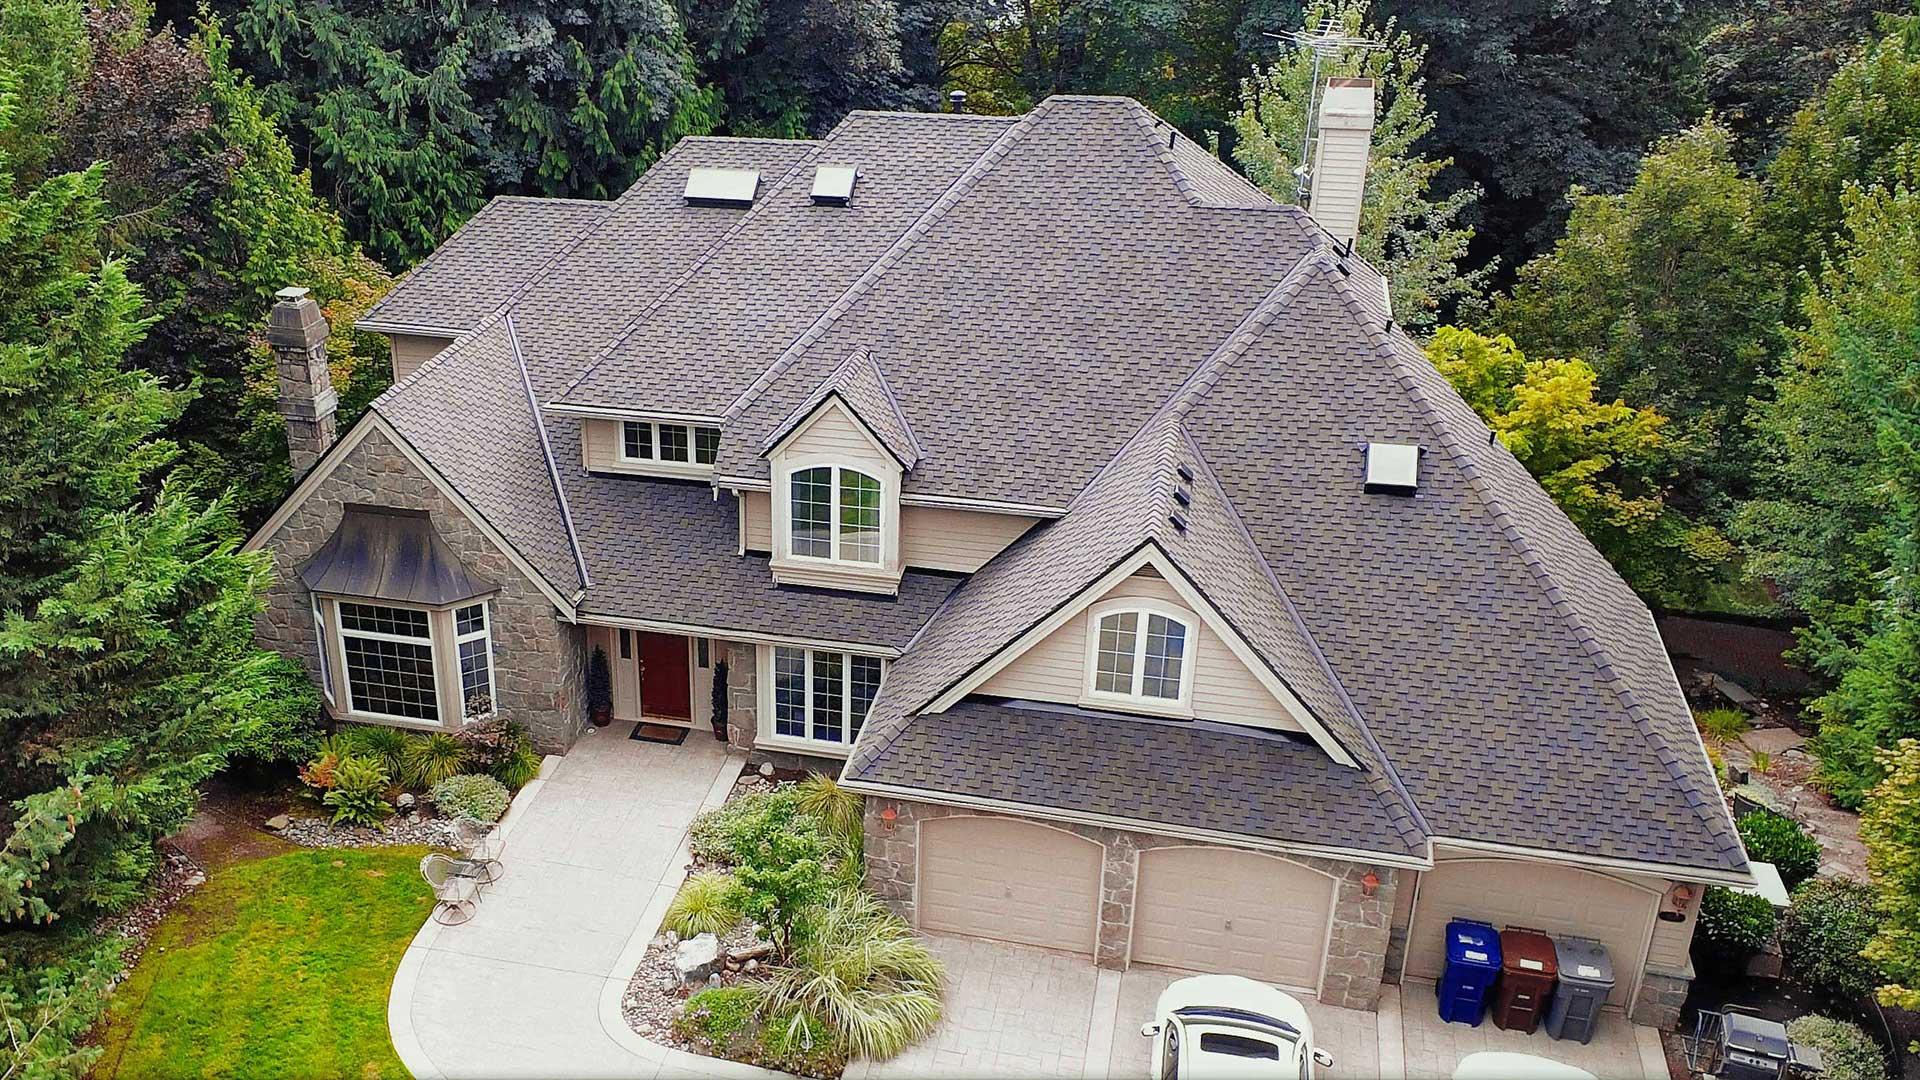 Samammish Cedar Shake Roof Conversion to Composite Shingles